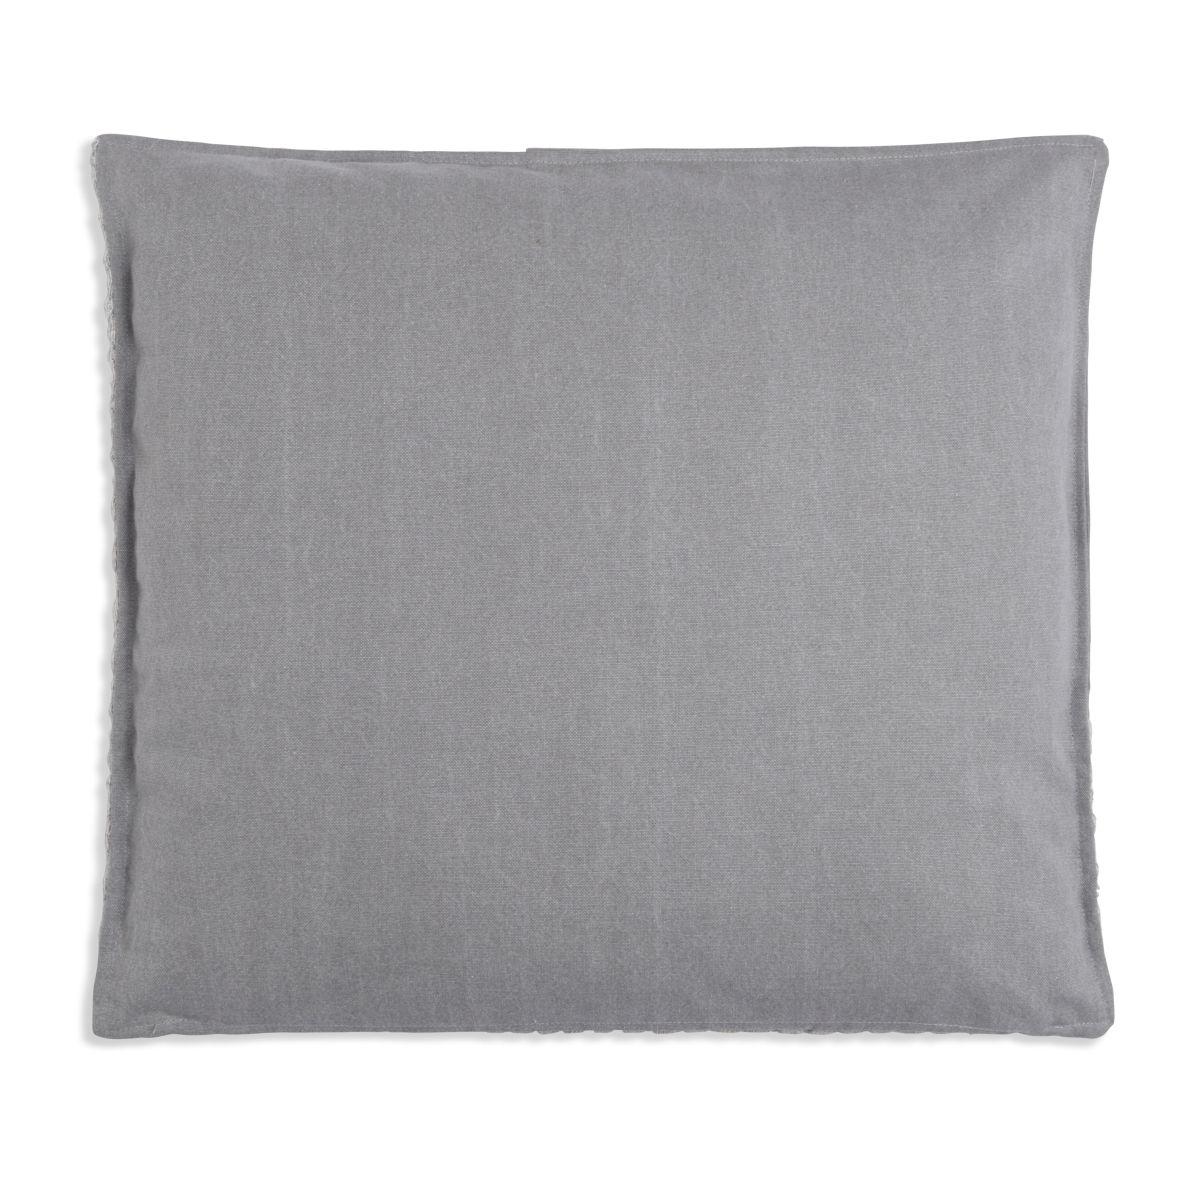 knit factory 1251249 kussen 50x50 jack grijs beige 2